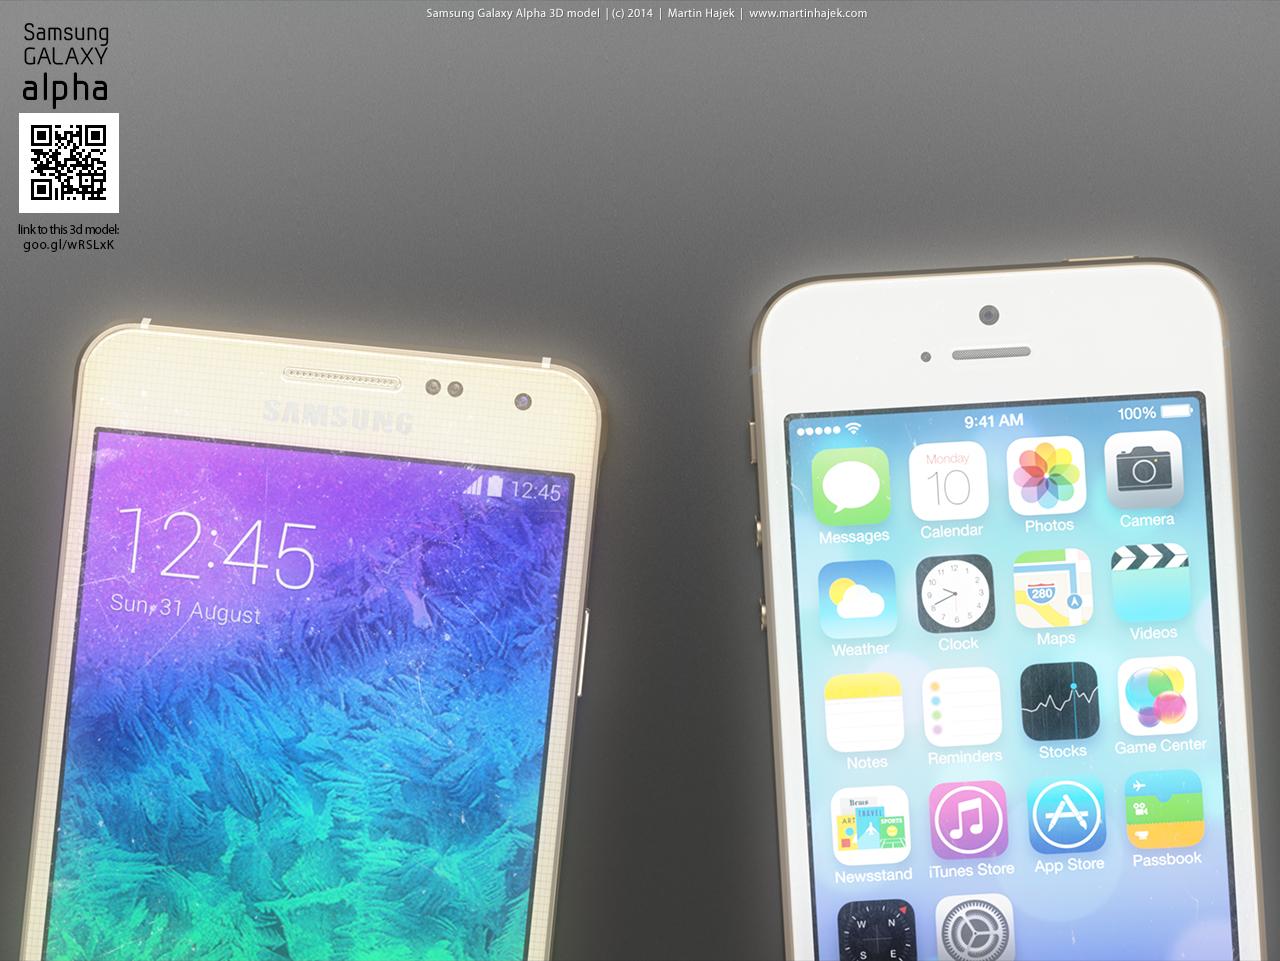 iPhone-5s-vs-Galaxy-Alpha_03